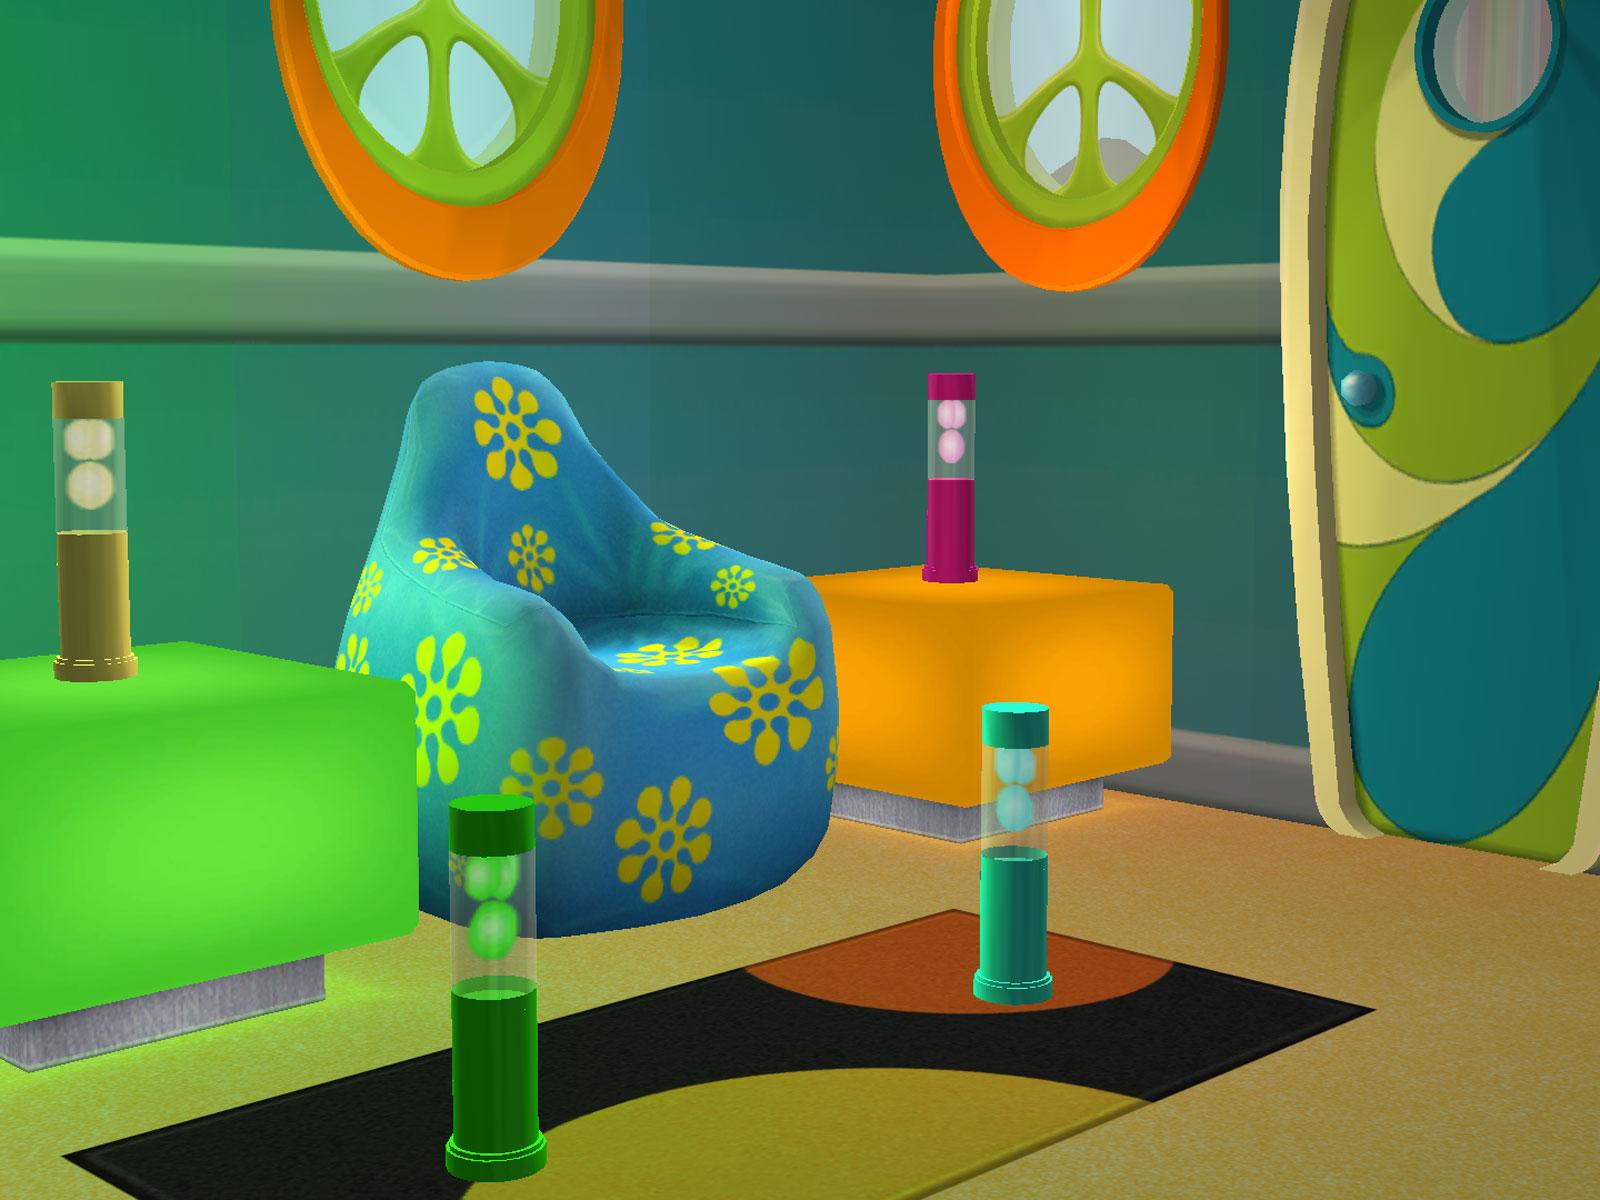 http://www.parsimonious.org/furniture2/files/k8-Candy_Bubble_Jet.jpg